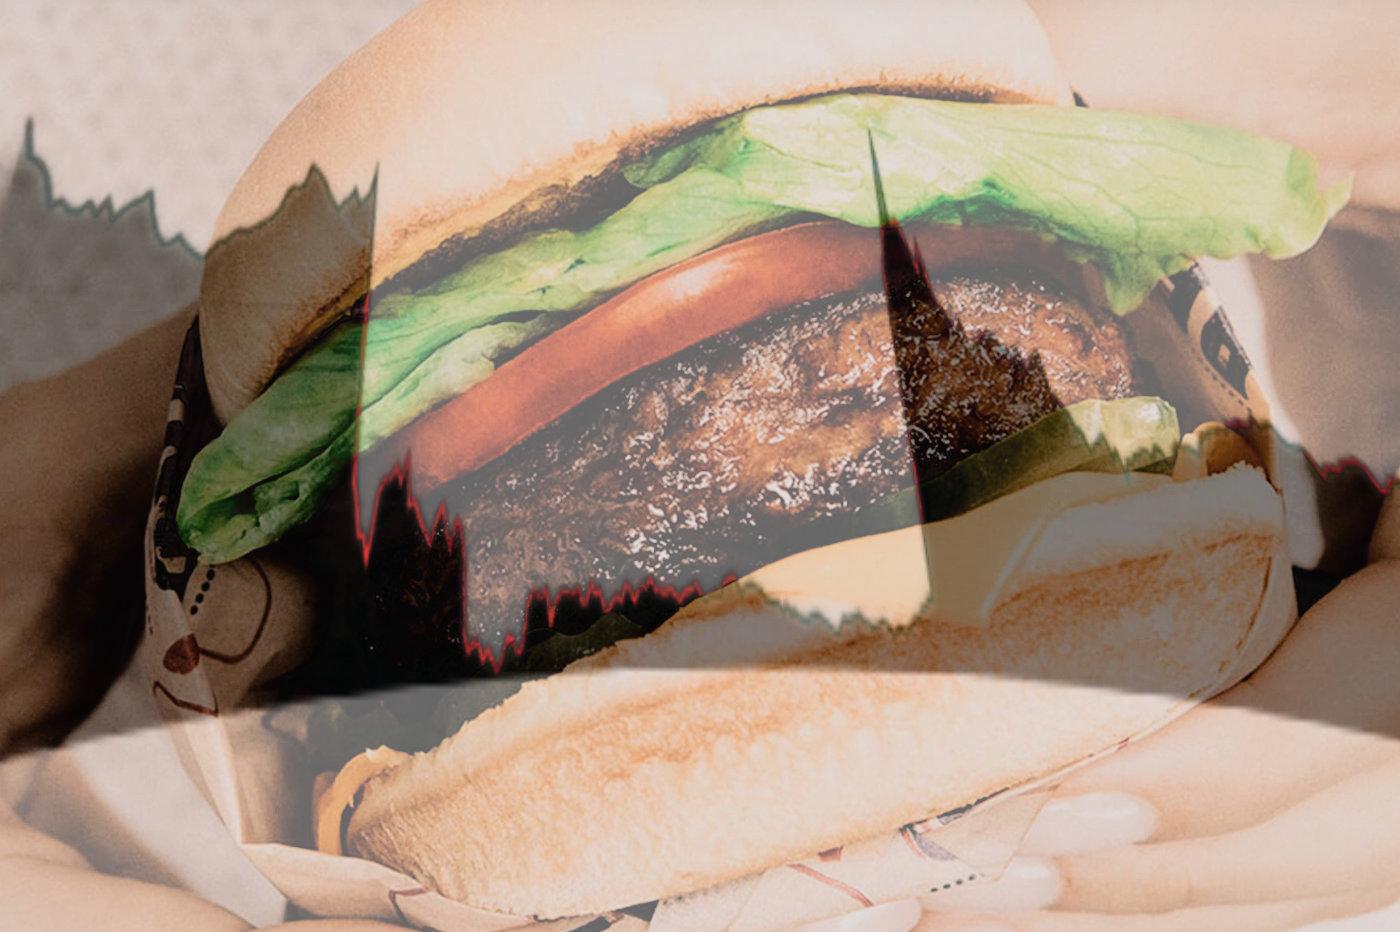 McDonald Beyond Meat